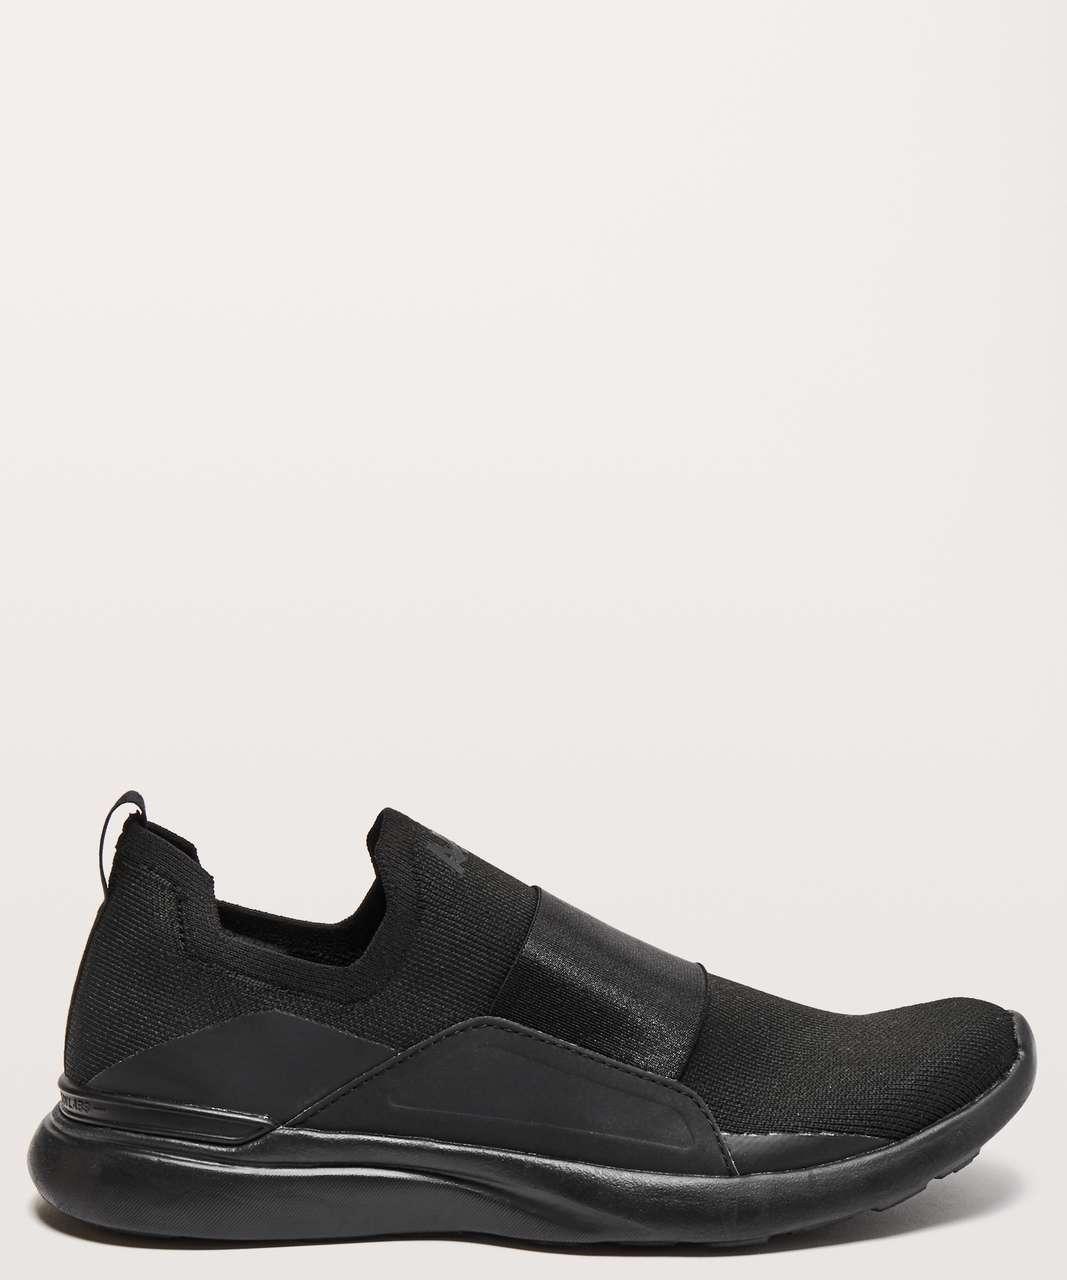 Lululemon Womens Bliss Water Resistant Shoe Black Black